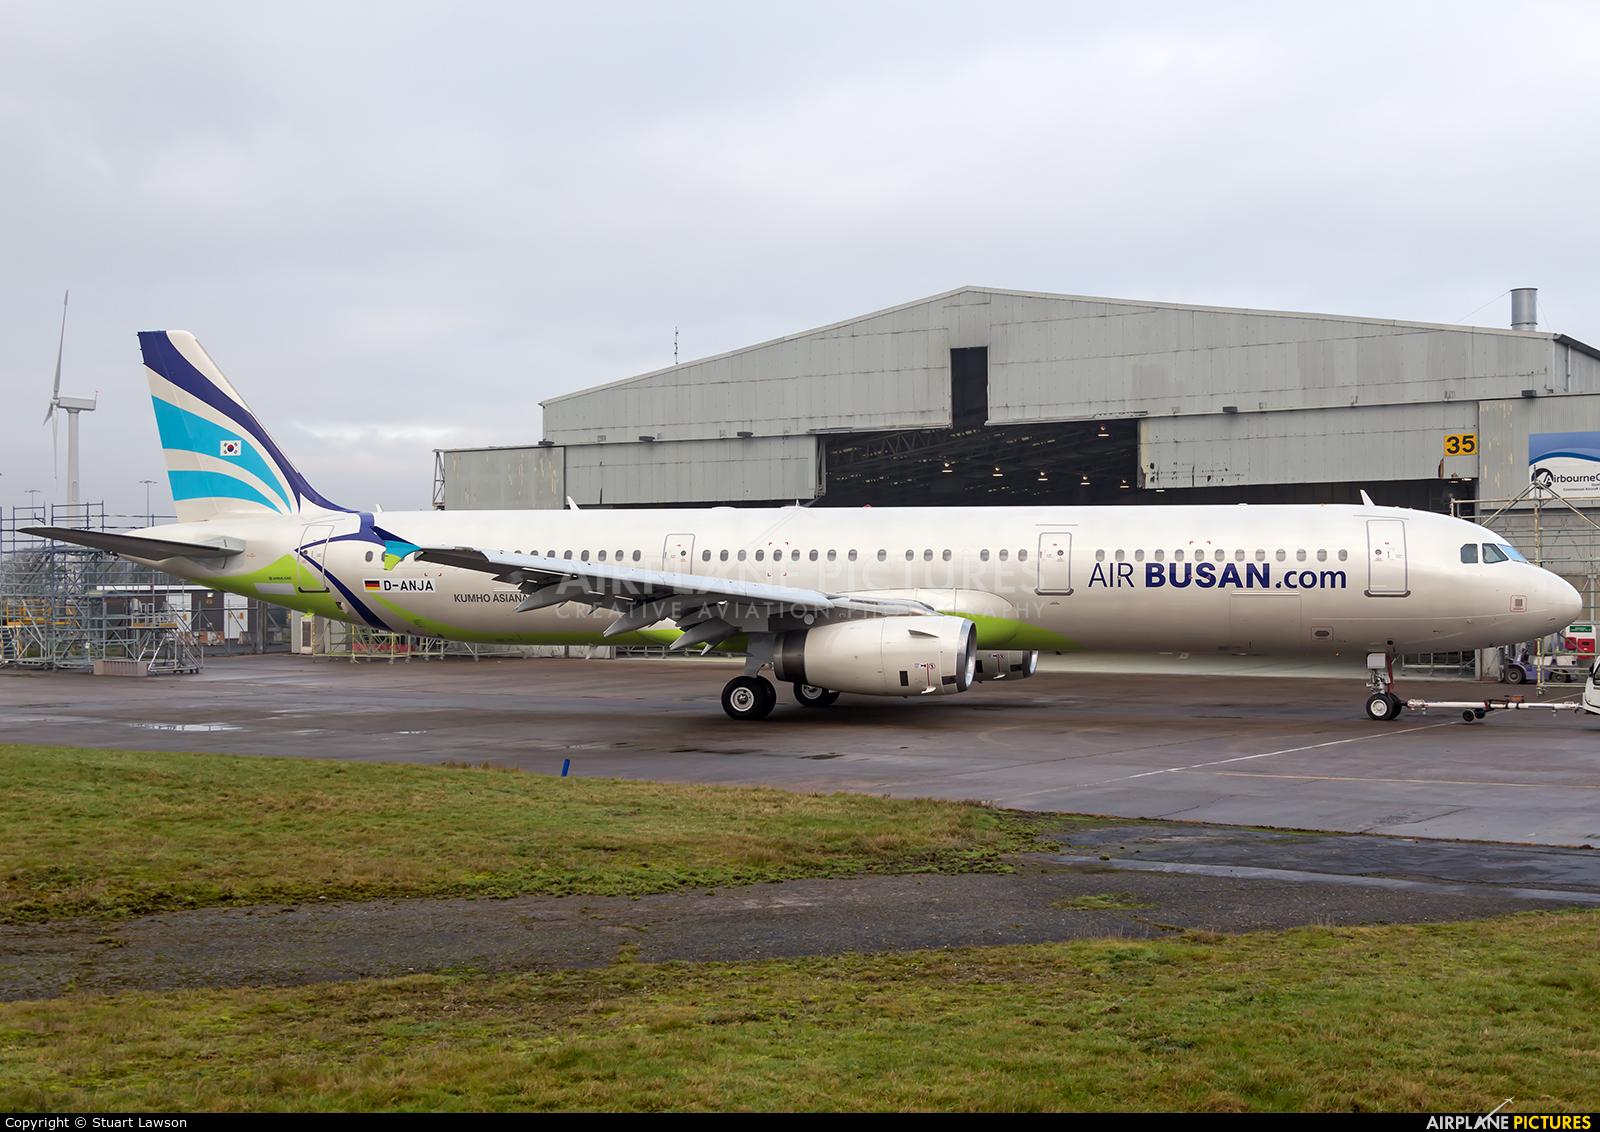 Air Busan D-ANJA aircraft at East Midlands